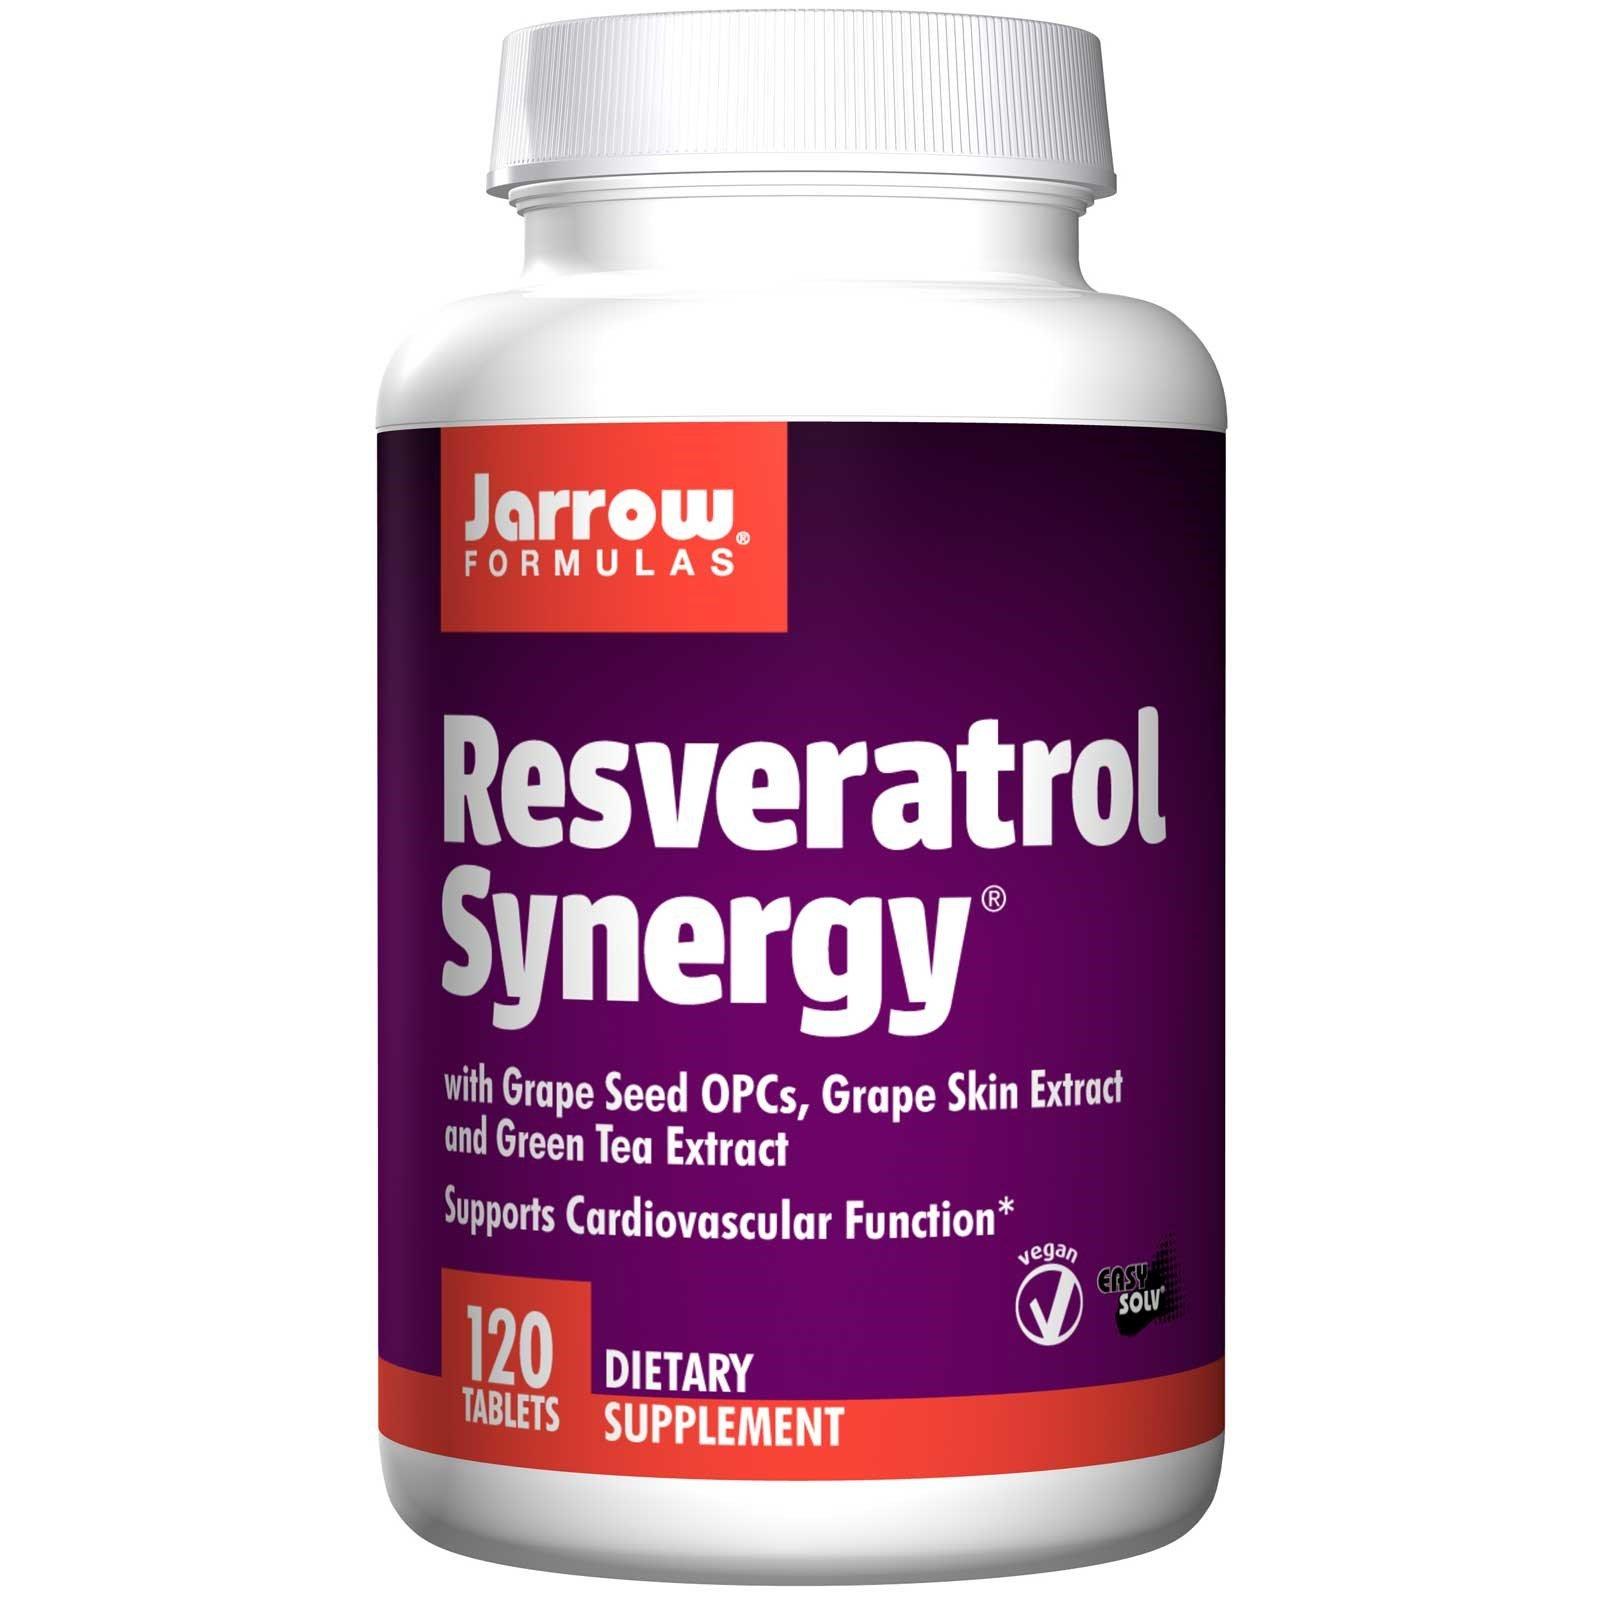 JARROW Formulas Resveratrol Synergy, 120 CT